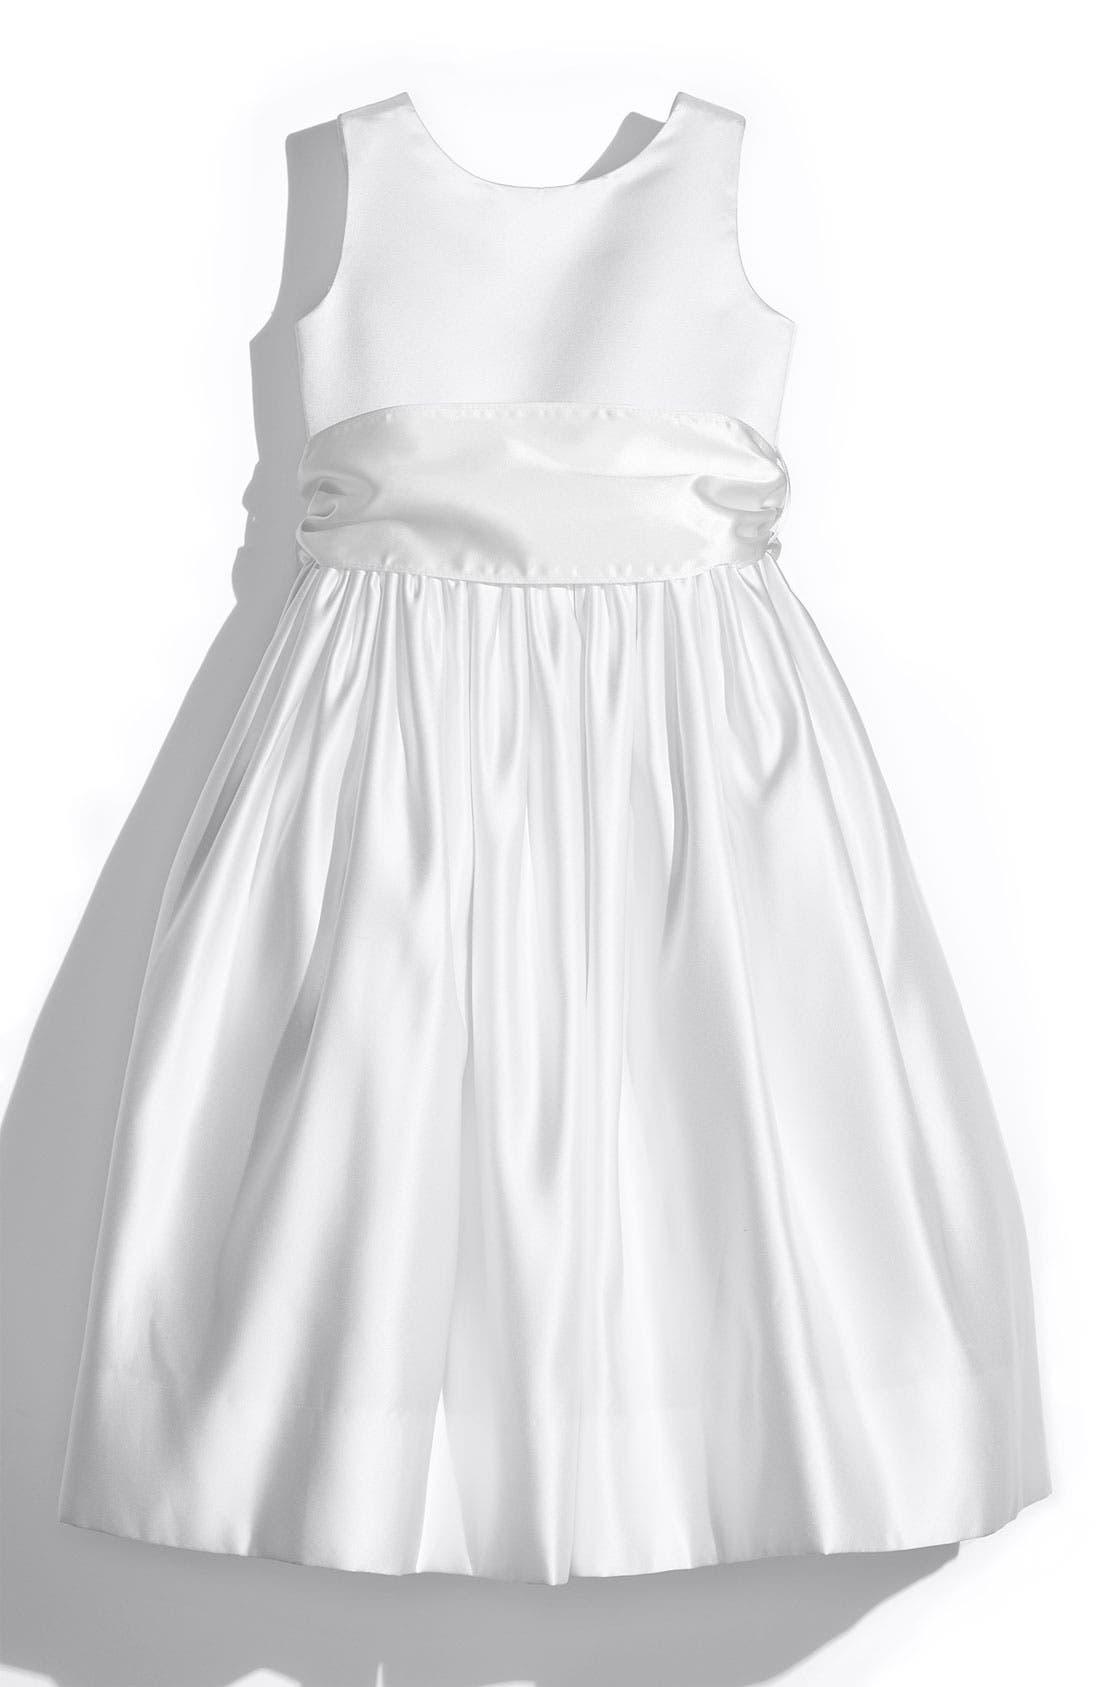 Us Angels White Tank Dress with Satin Sash (Toddler, Little Girls & Big Girls)